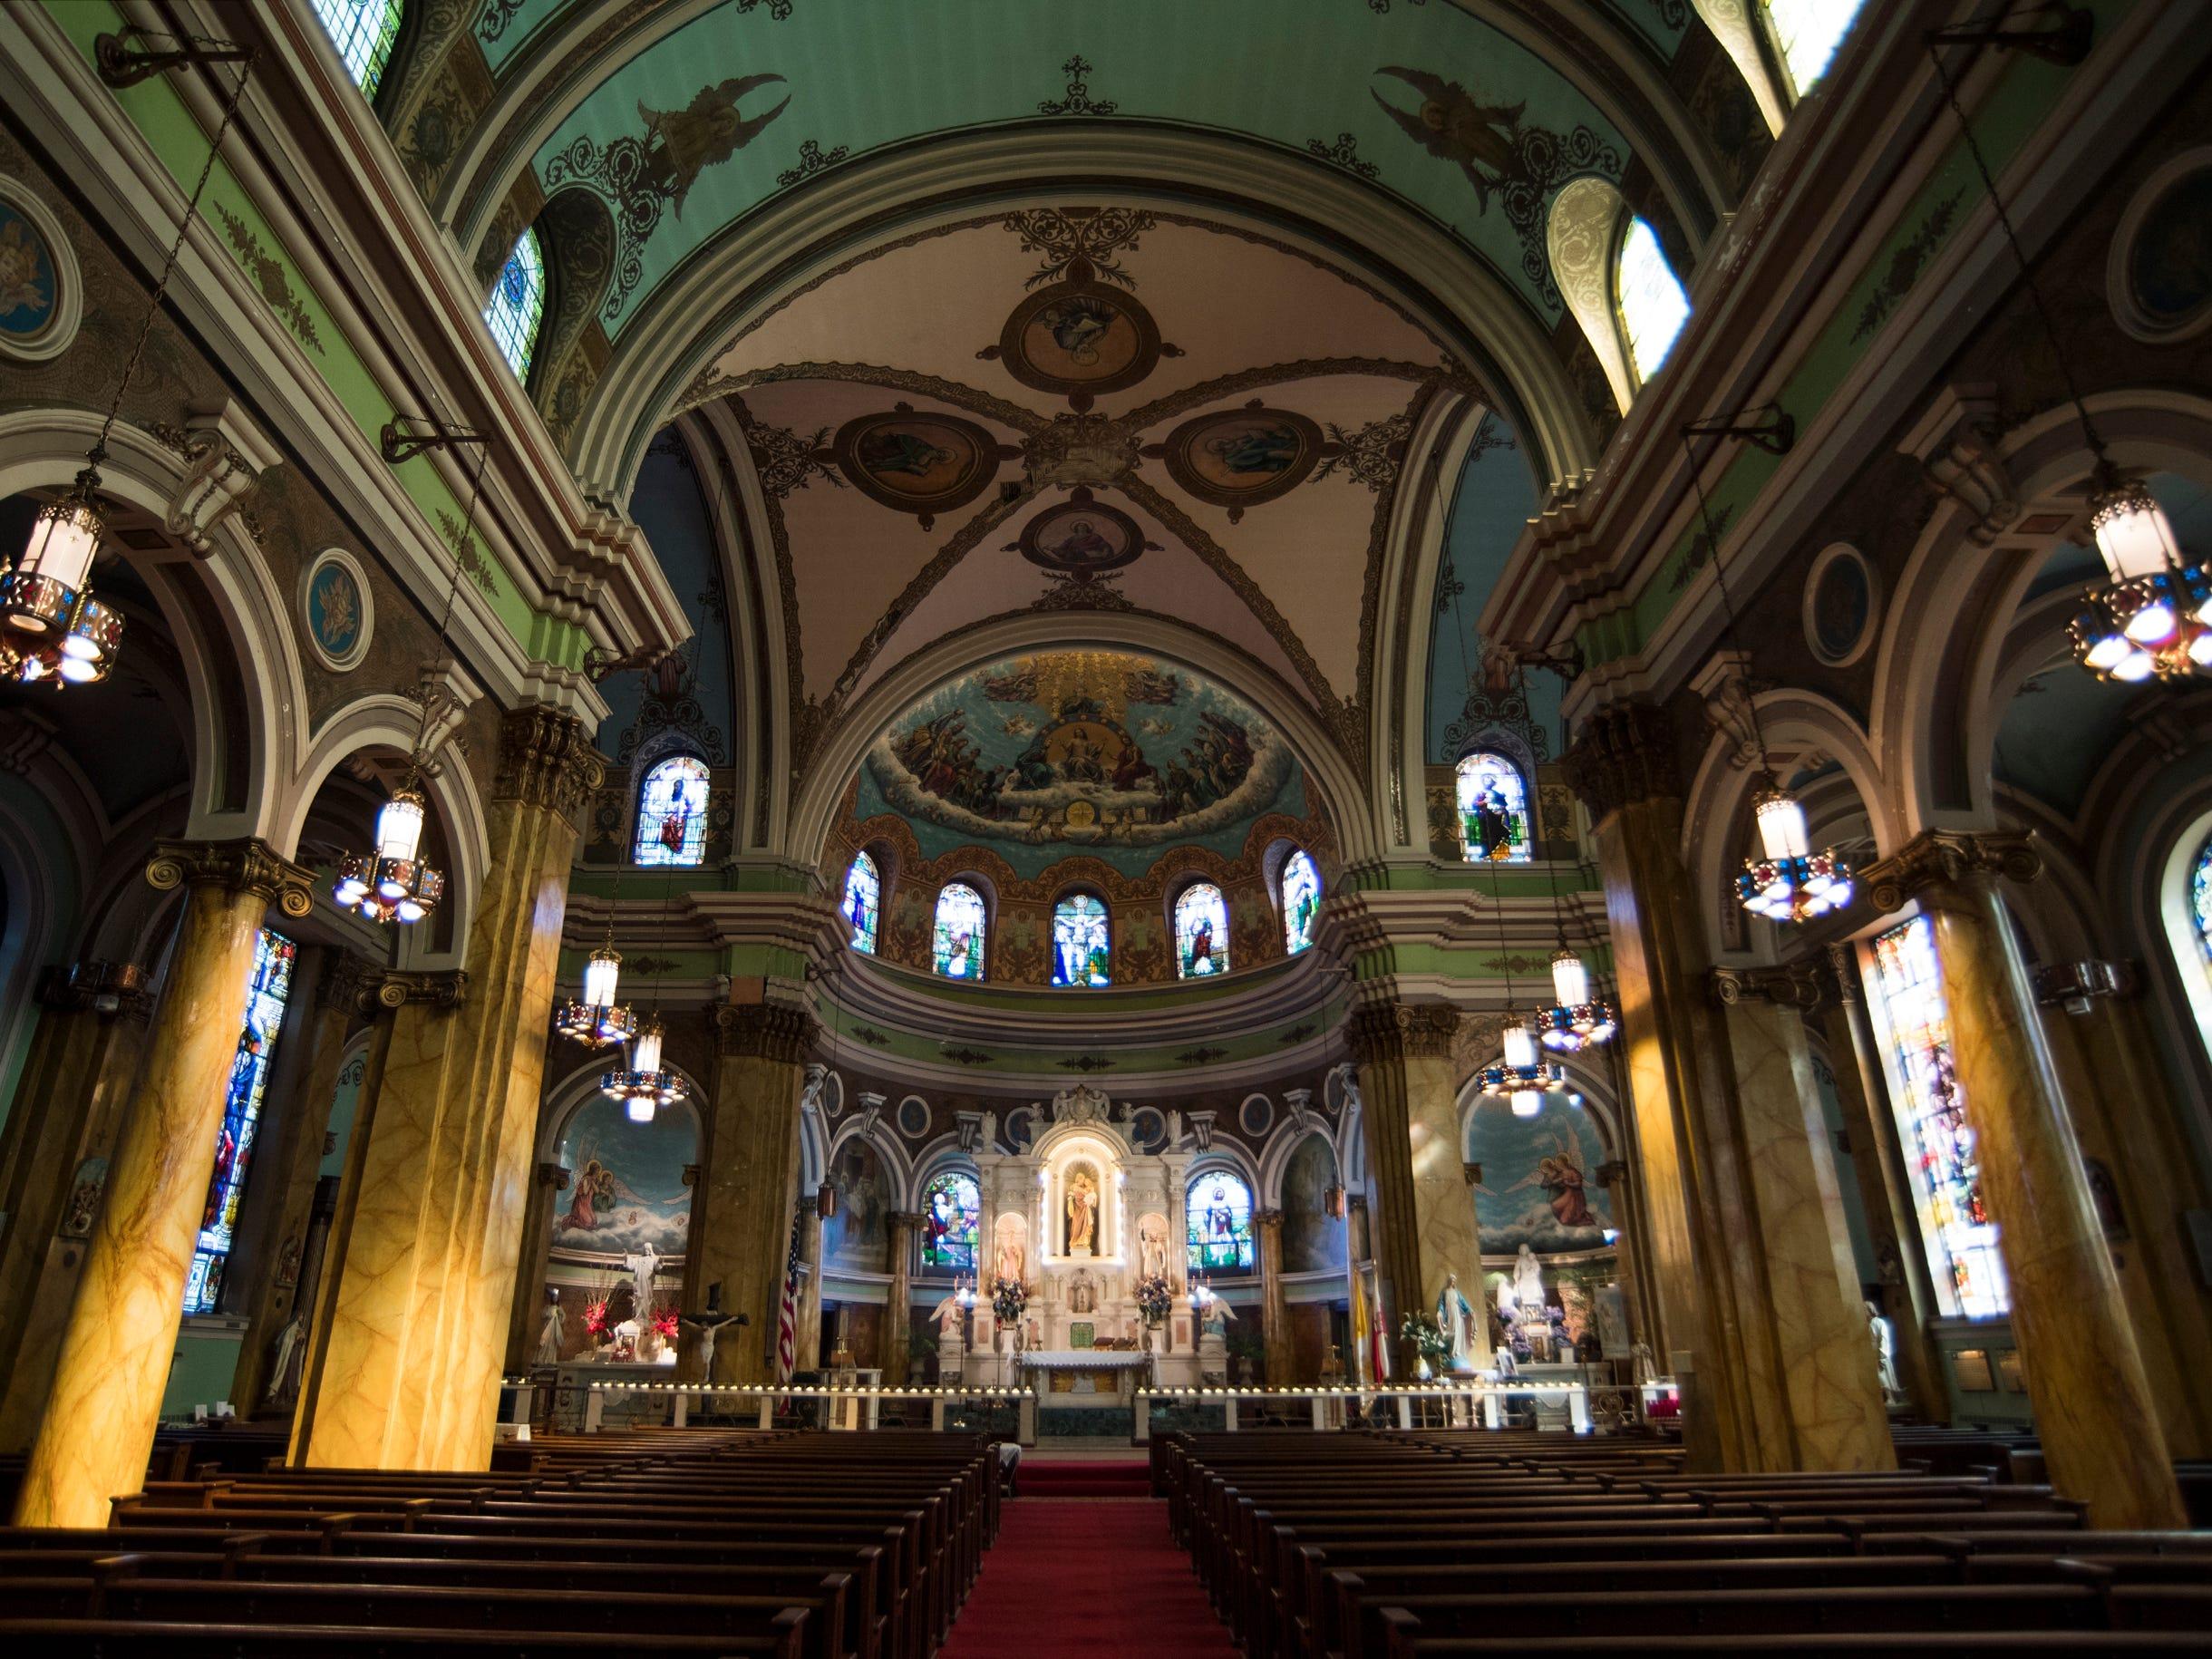 St. Joseph Roman Catholic Church Thursday, Feb. 28, 2019 in Camden, N.J.